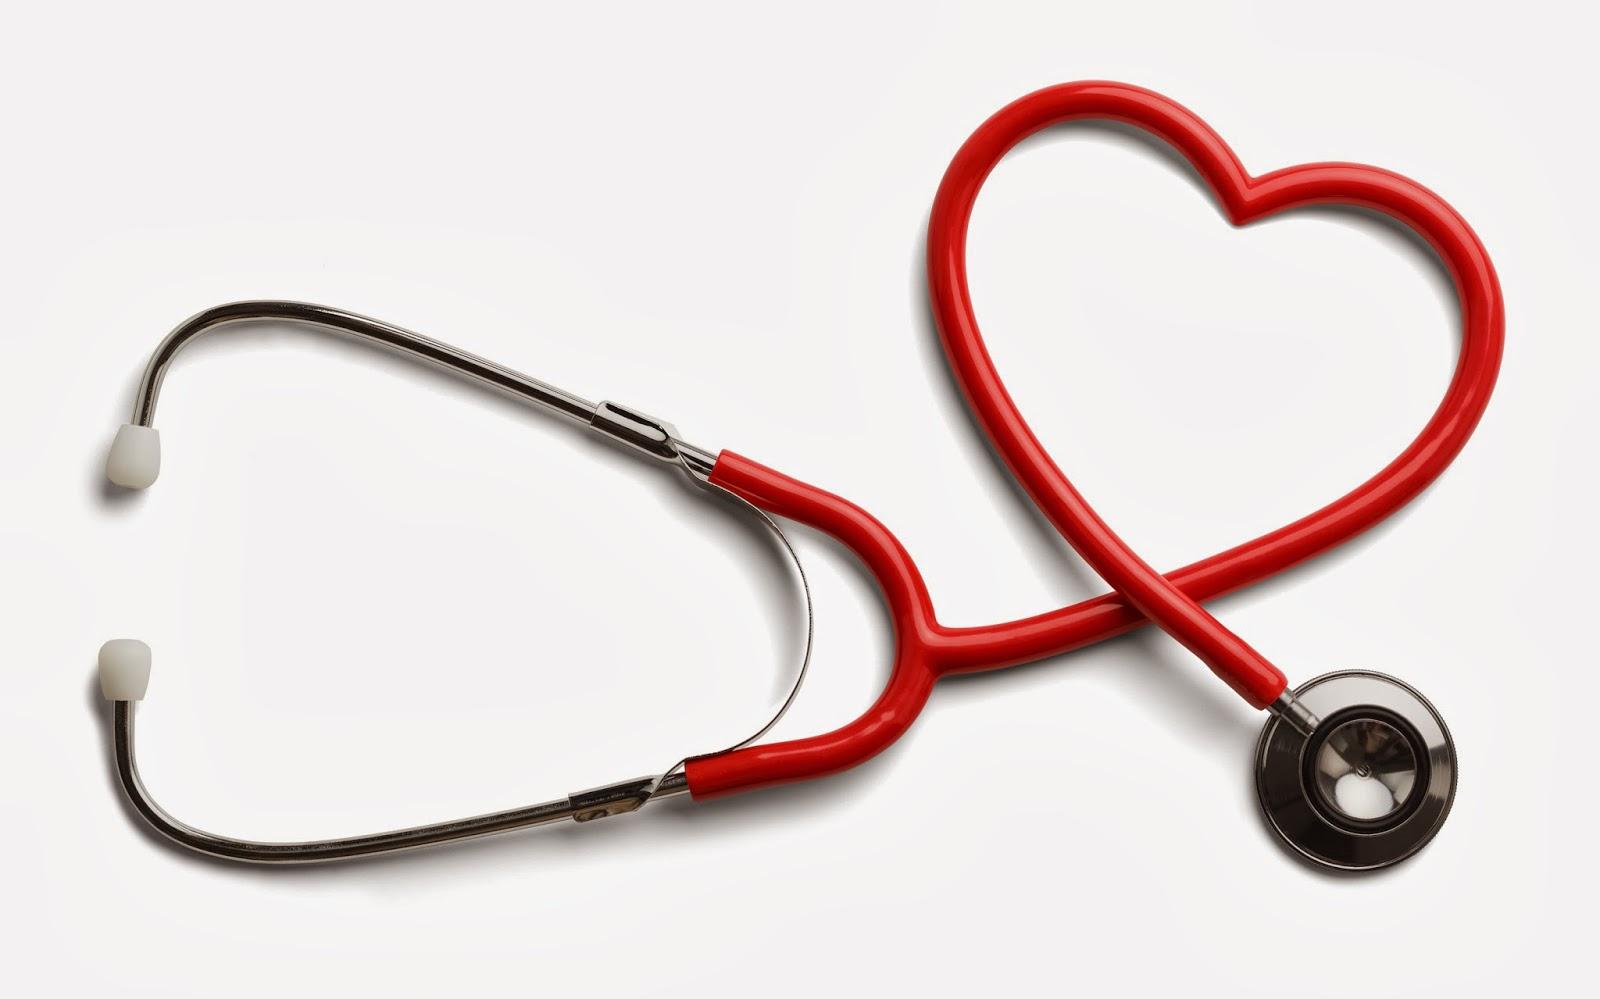 Heart Stethoscope 1600x999